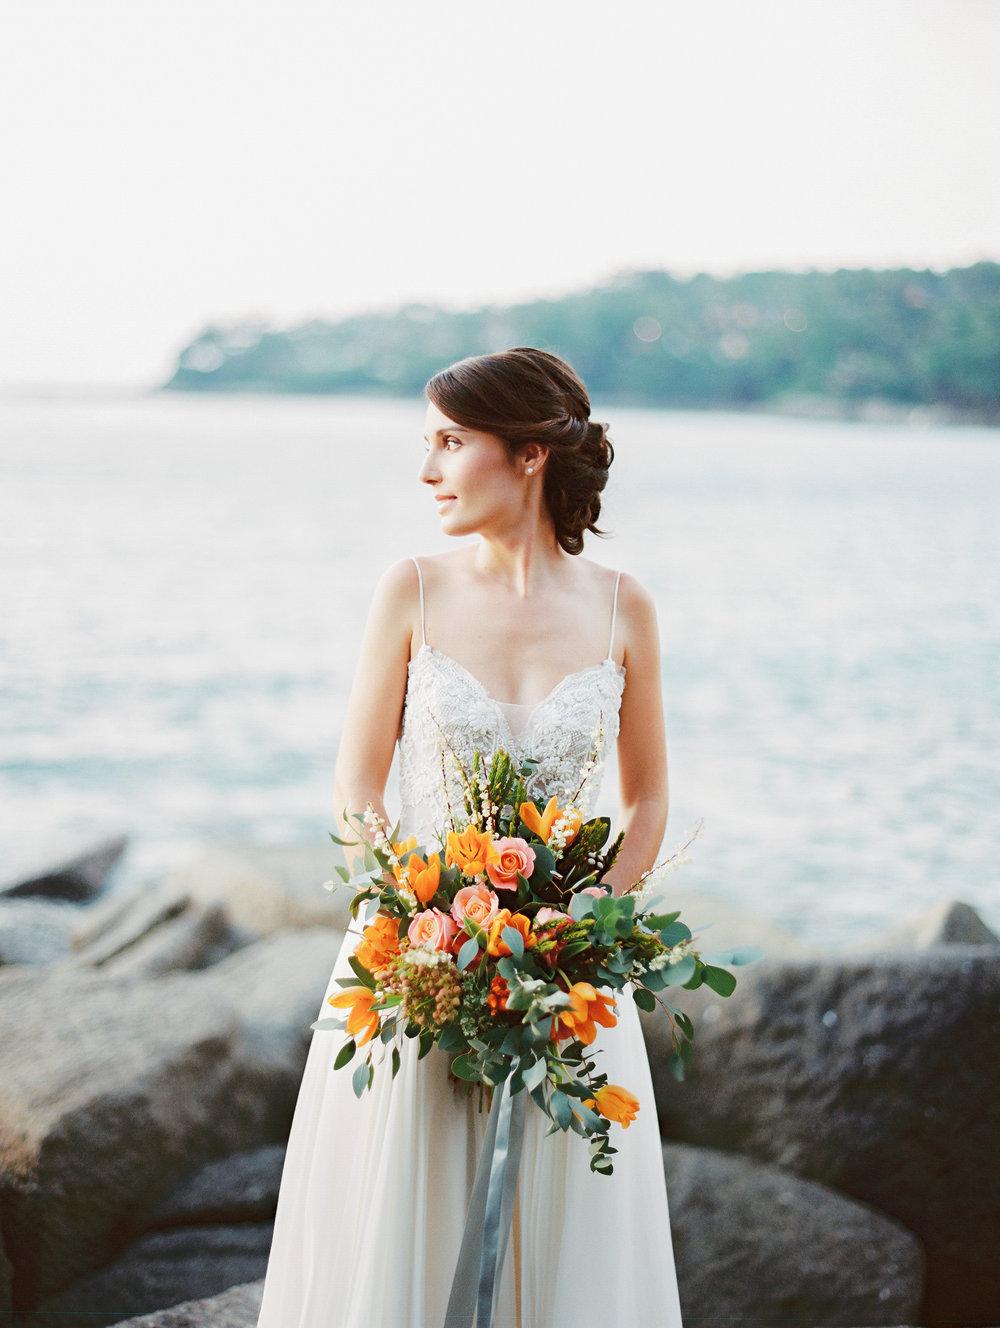 The-Wedding-Bliss-Thailand-231.jpg